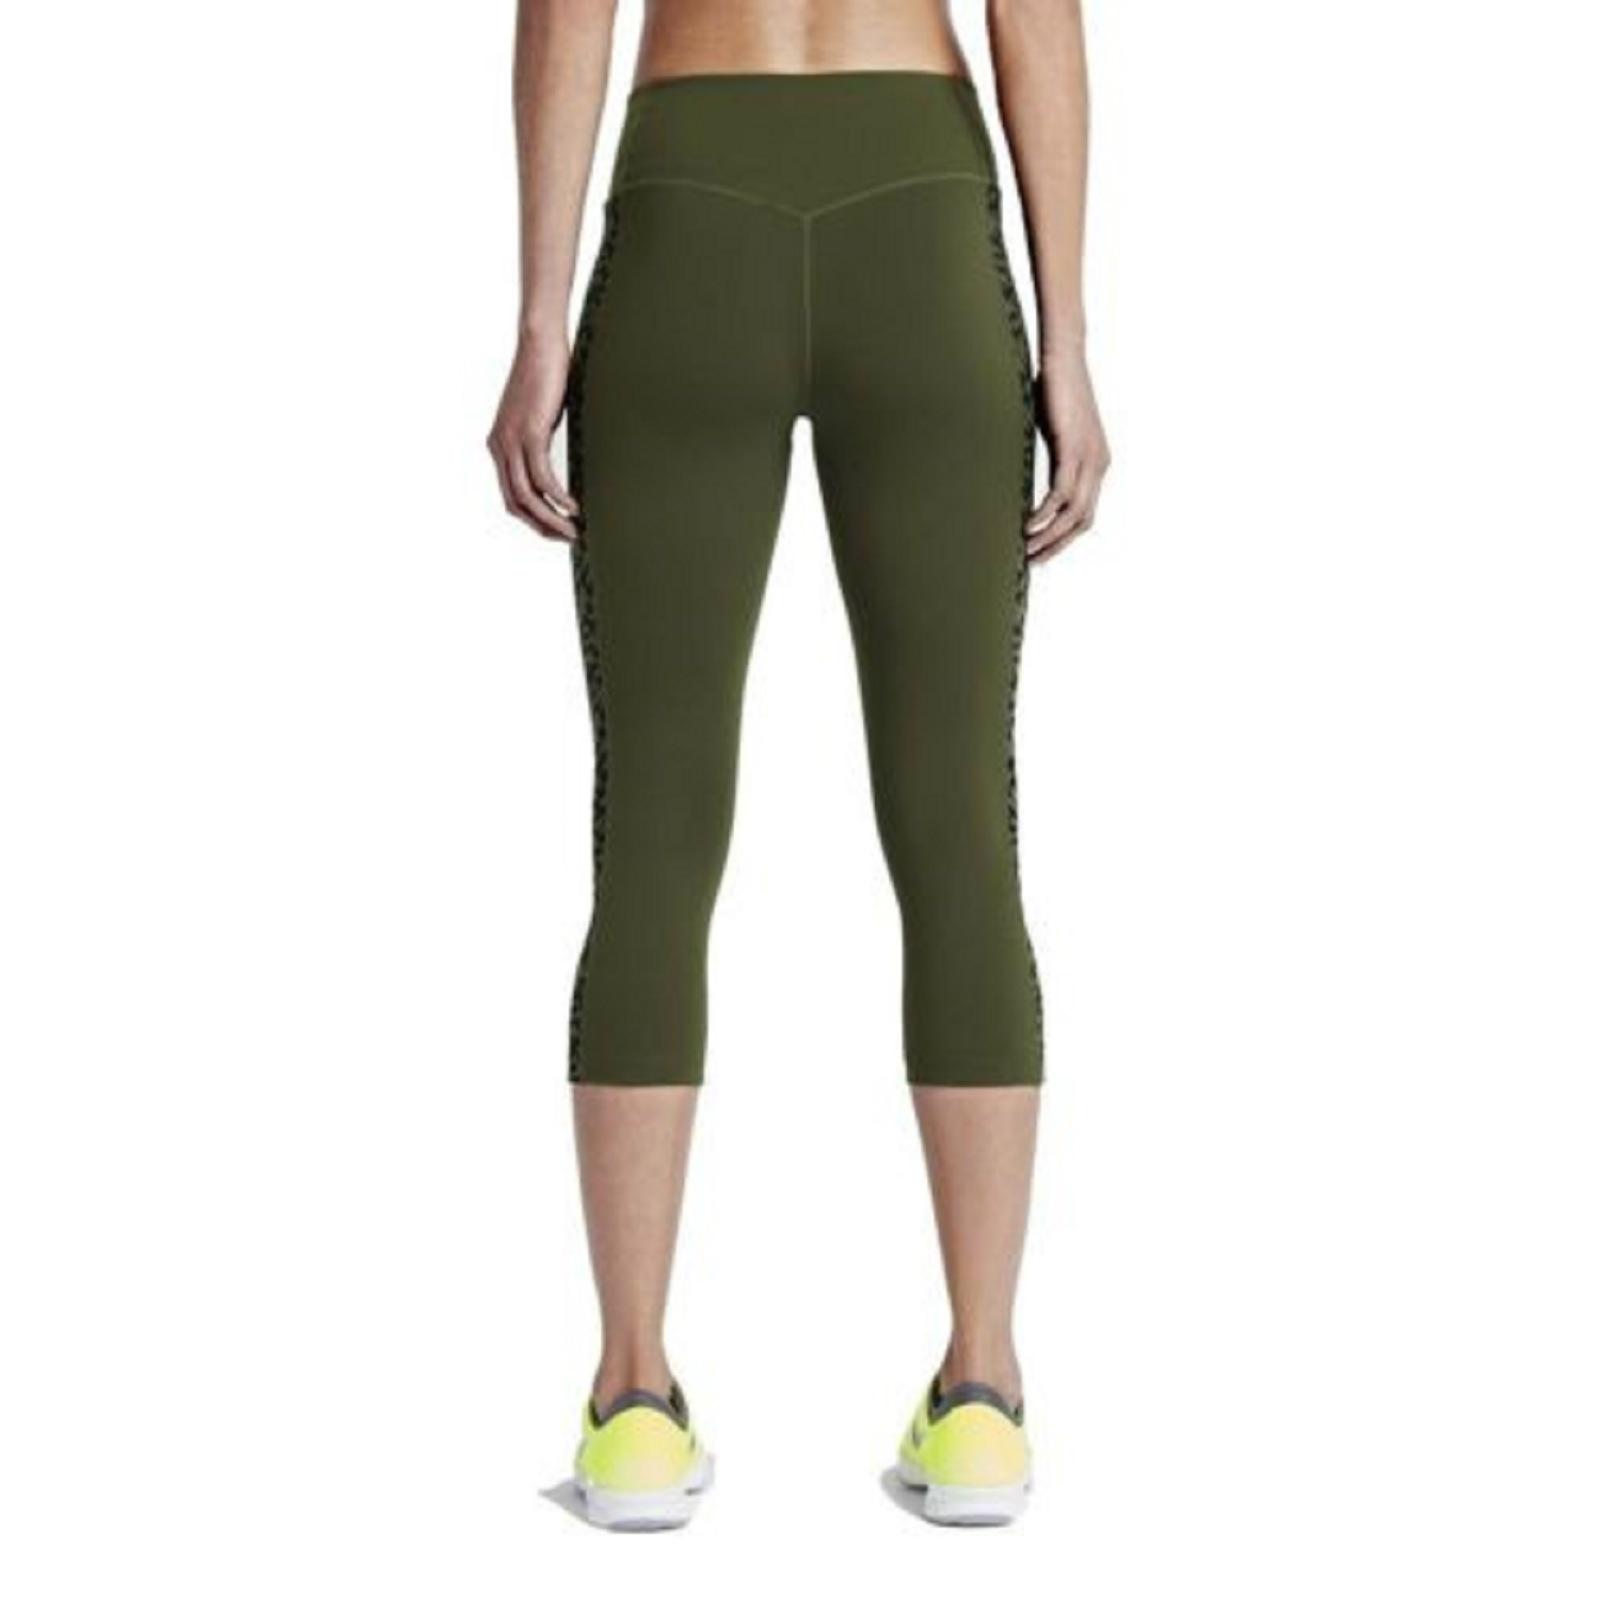 Nike Dri Fit Women's $90 Legendary Checker Training Tights 2.0 Capris Pants  XL